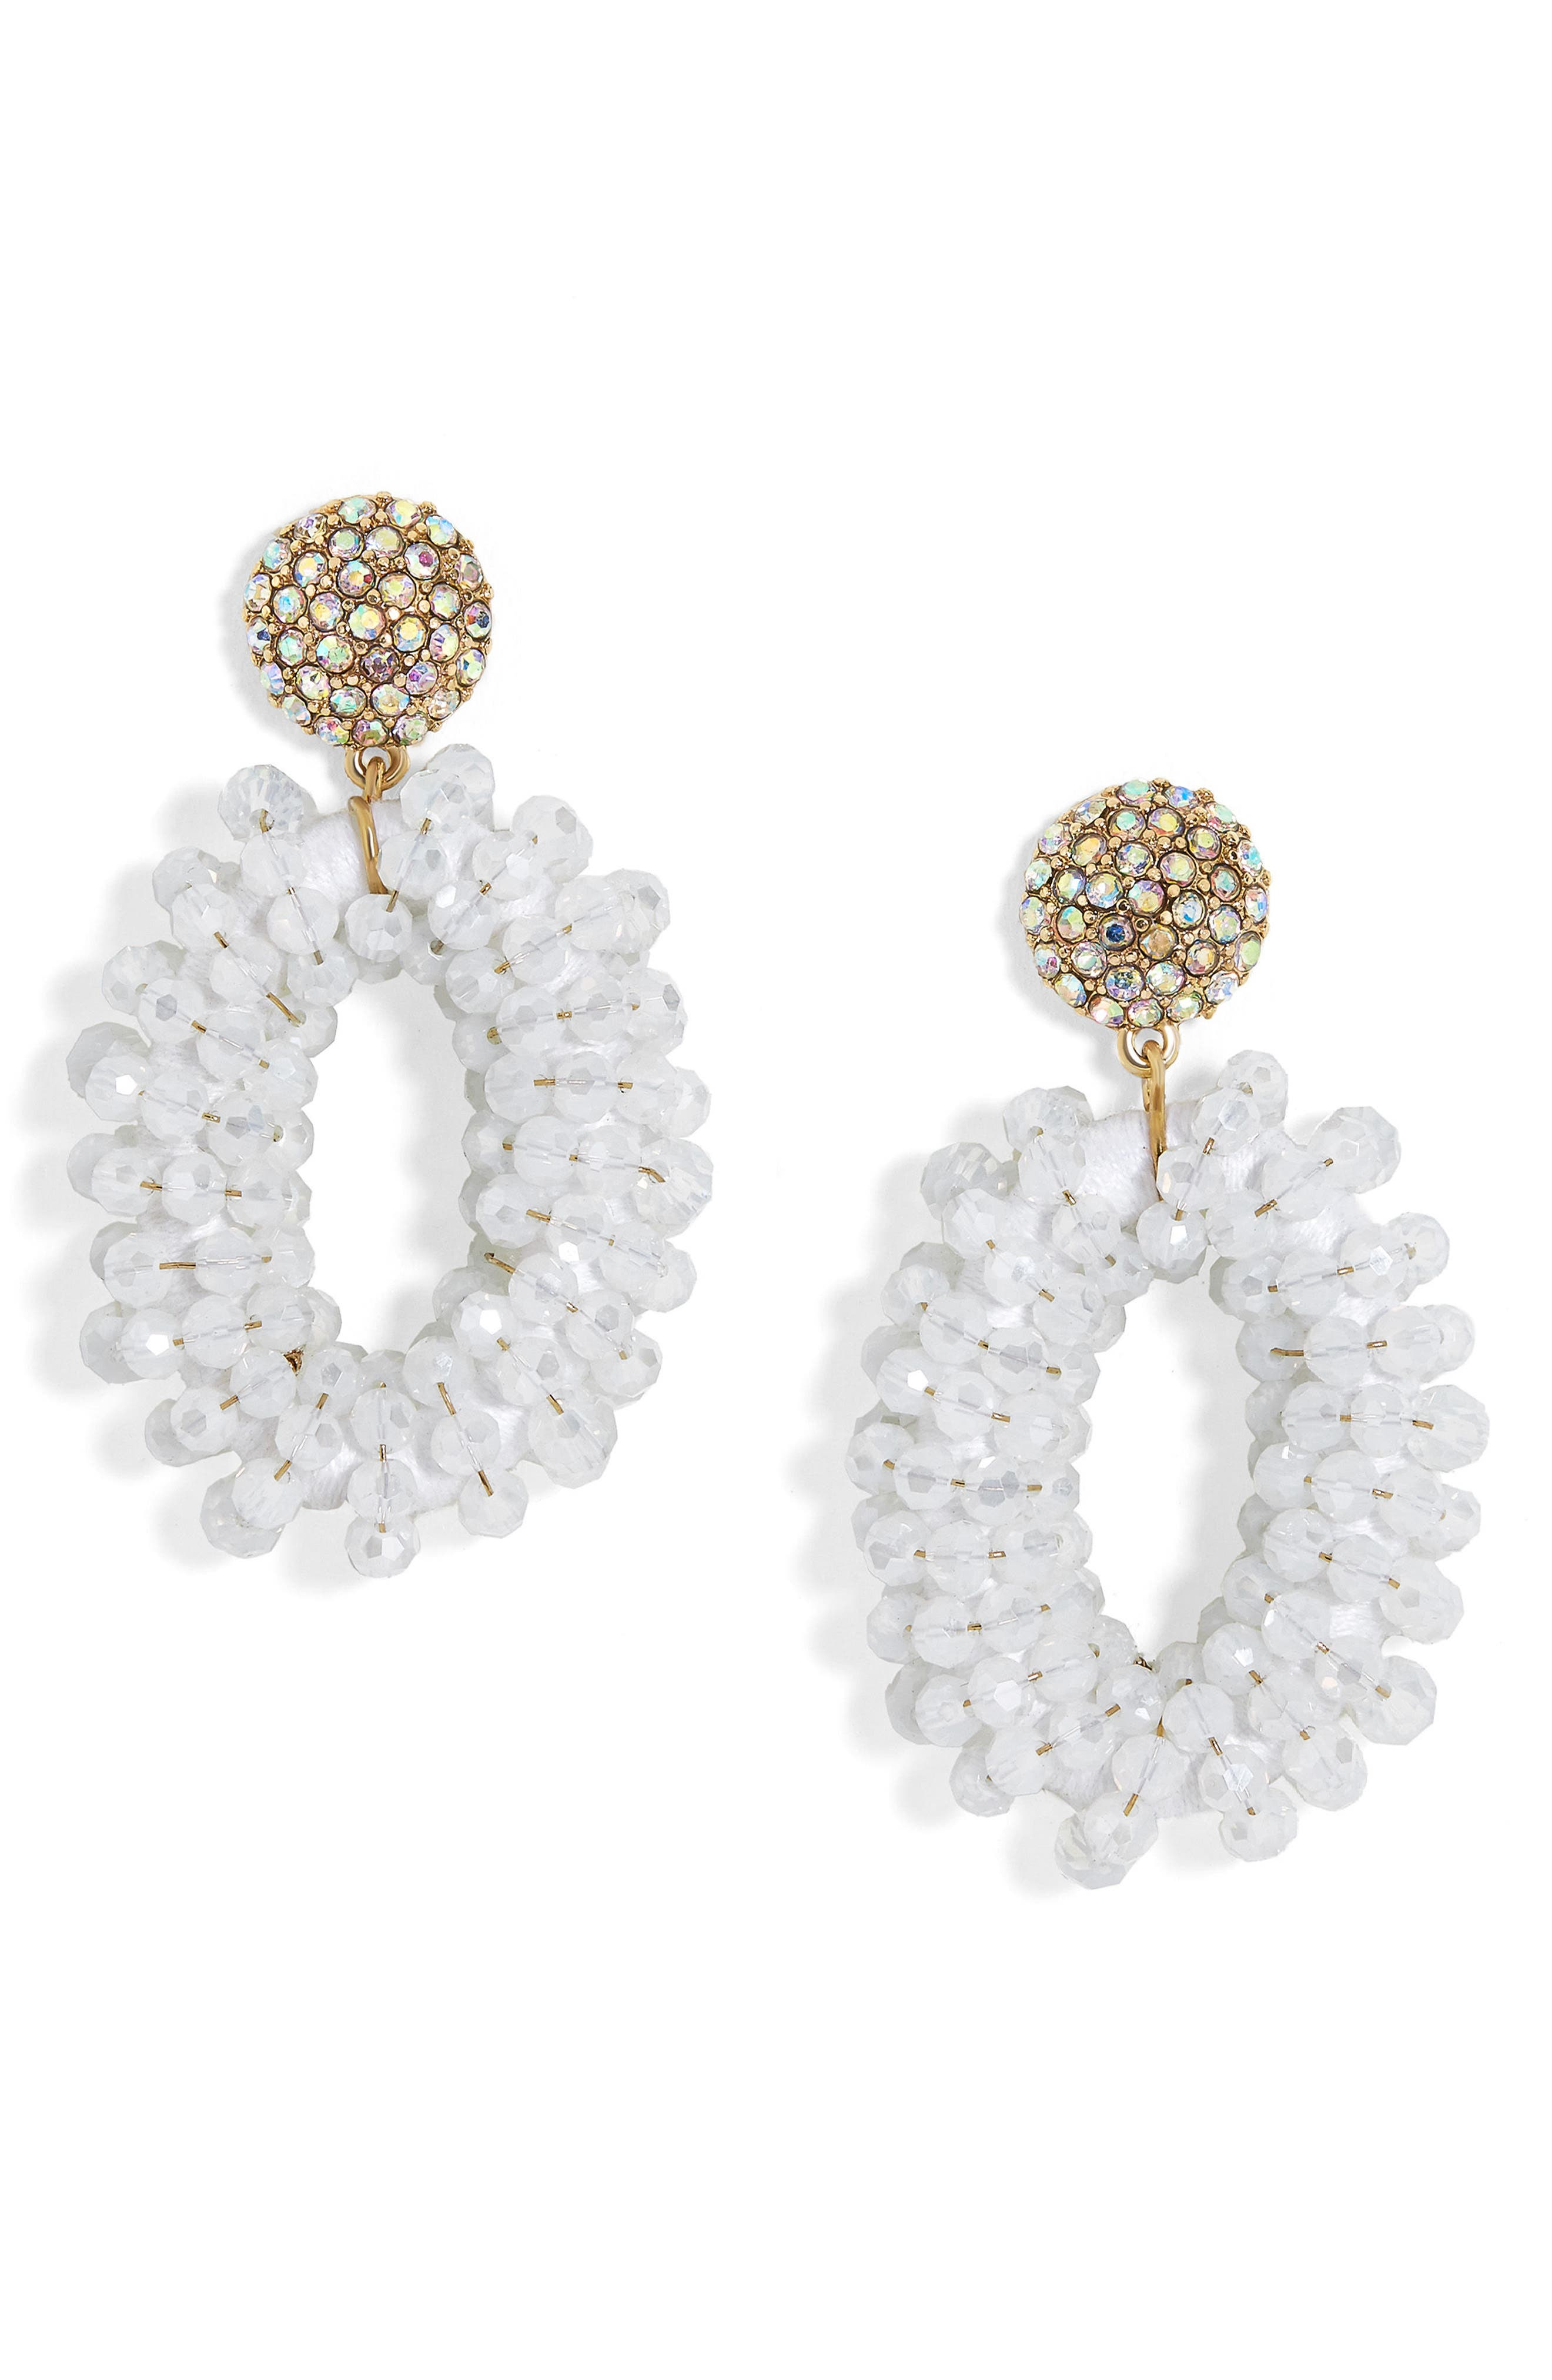 Main Image - BaubleBar Eve Beaded Drop Earrings